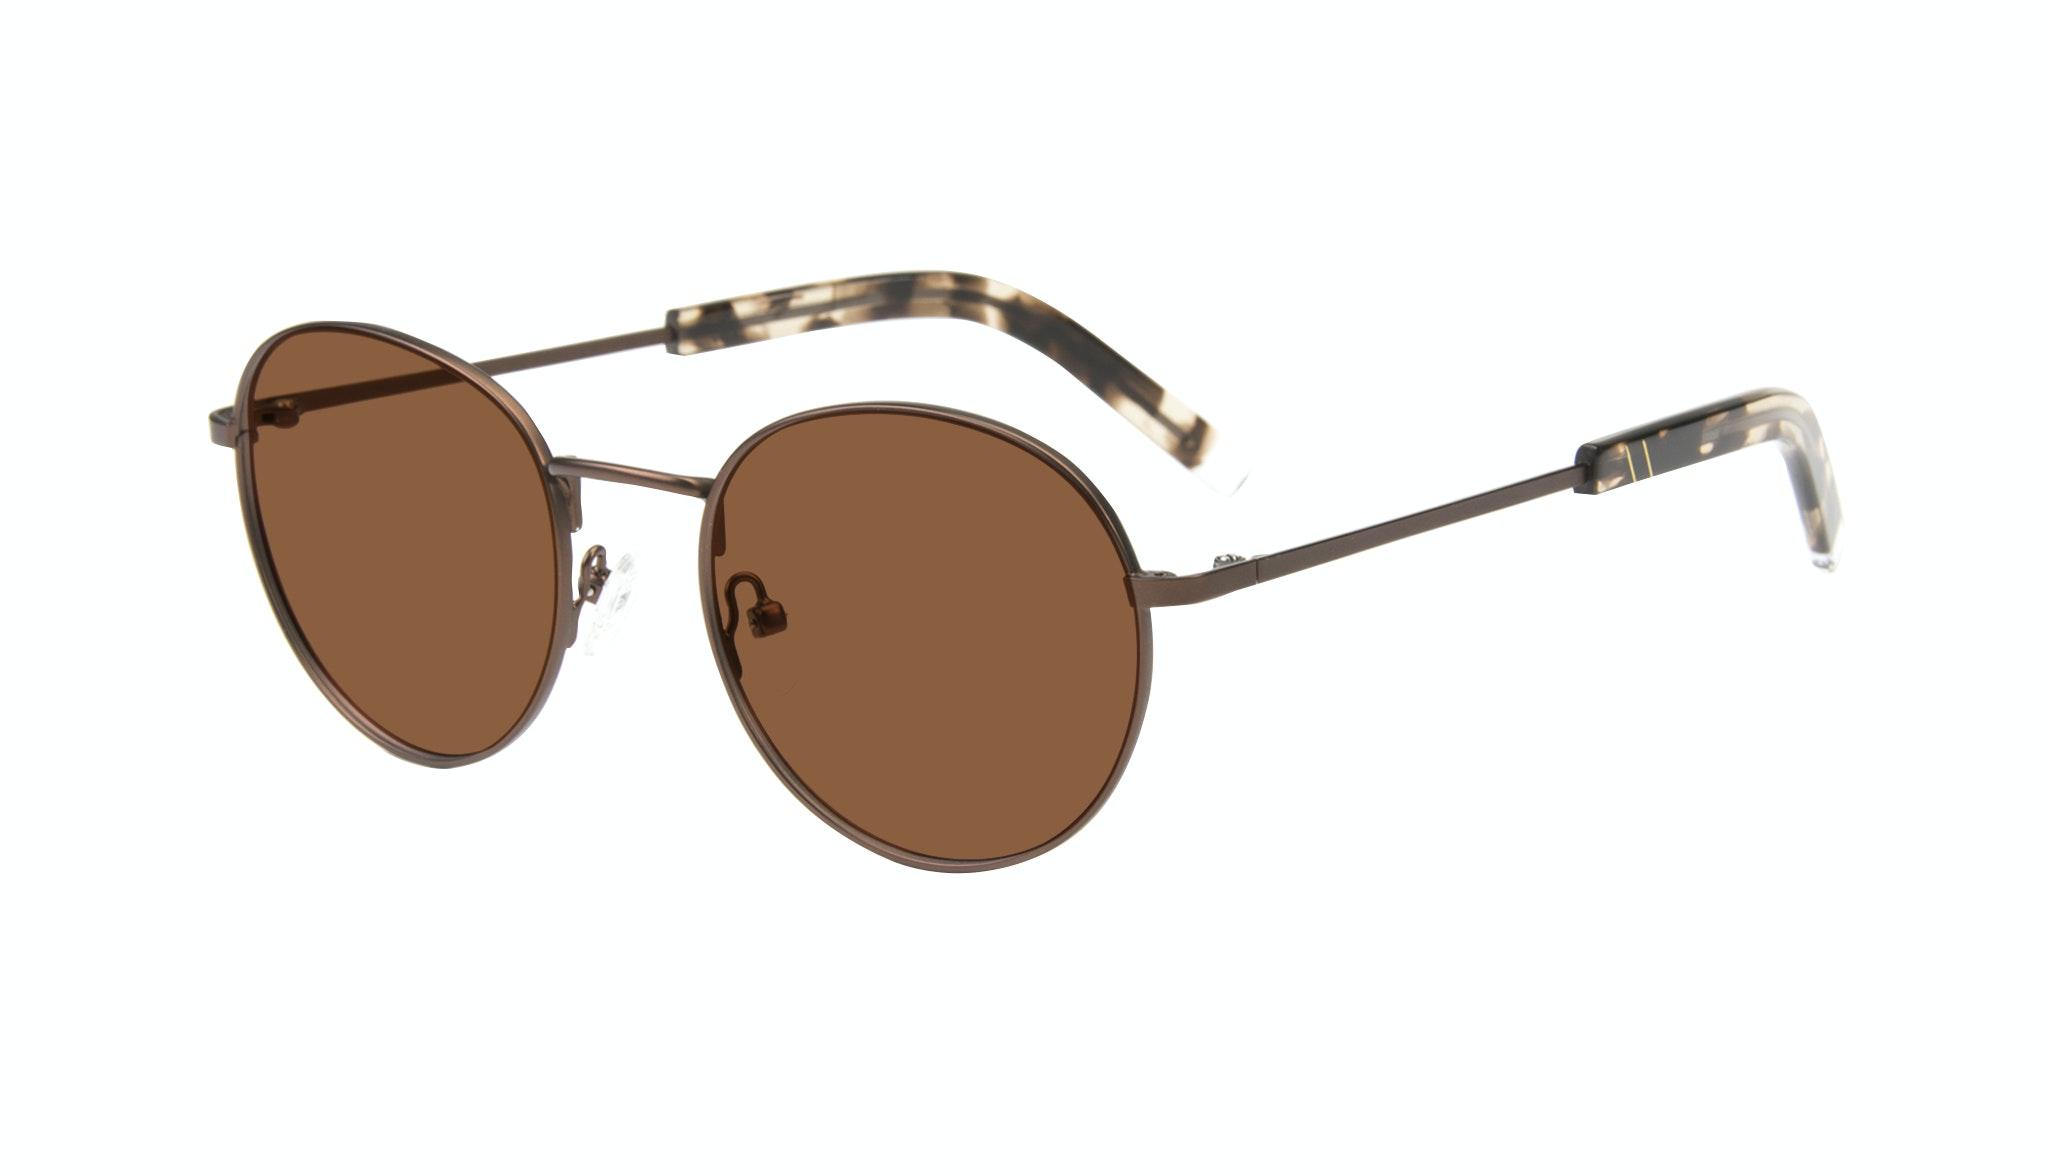 Affordable Fashion Glasses Round Sunglasses Men Lean Mud Tilt